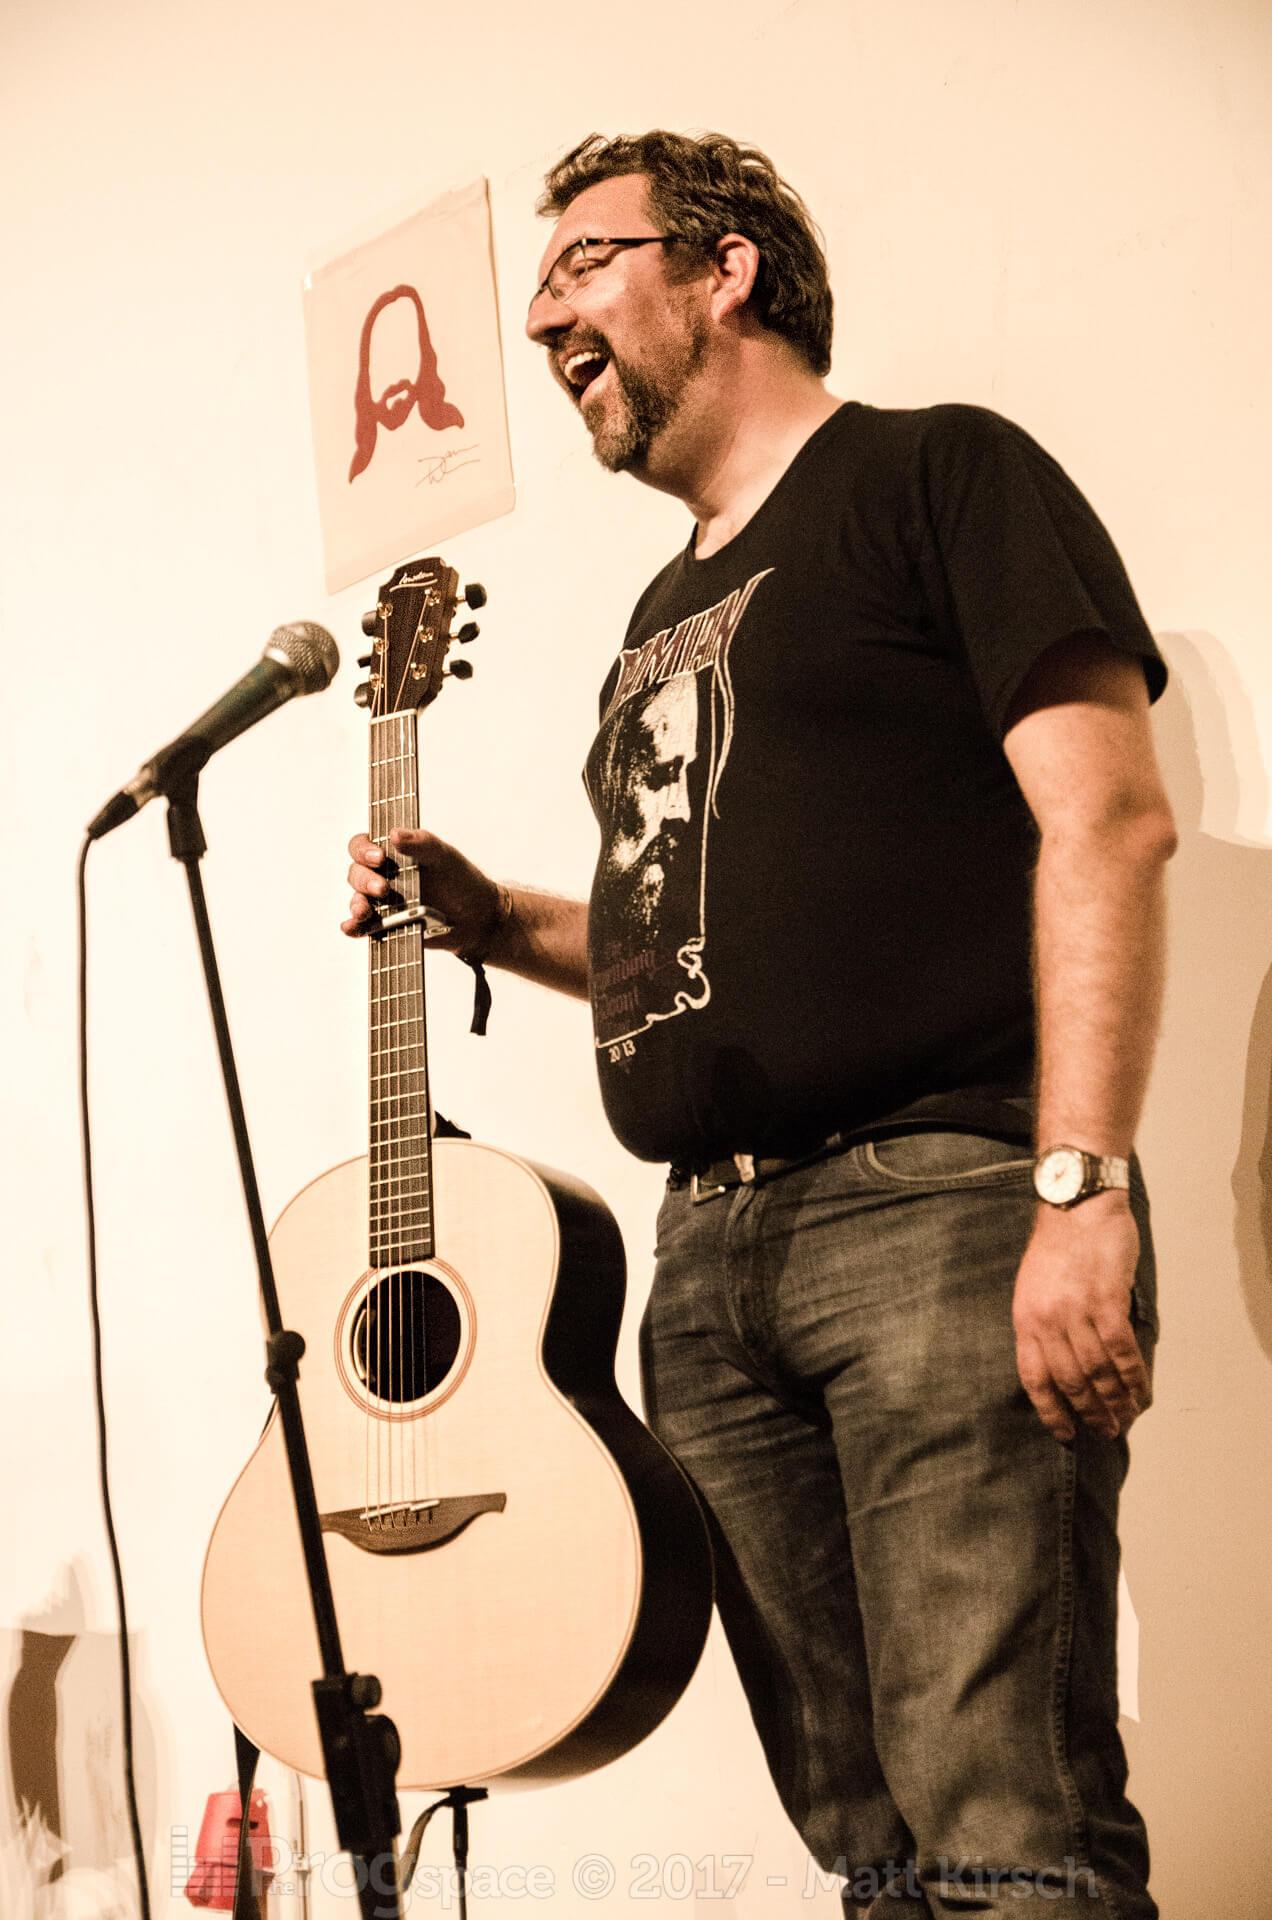 Damian Wilson at ProgPower 2017